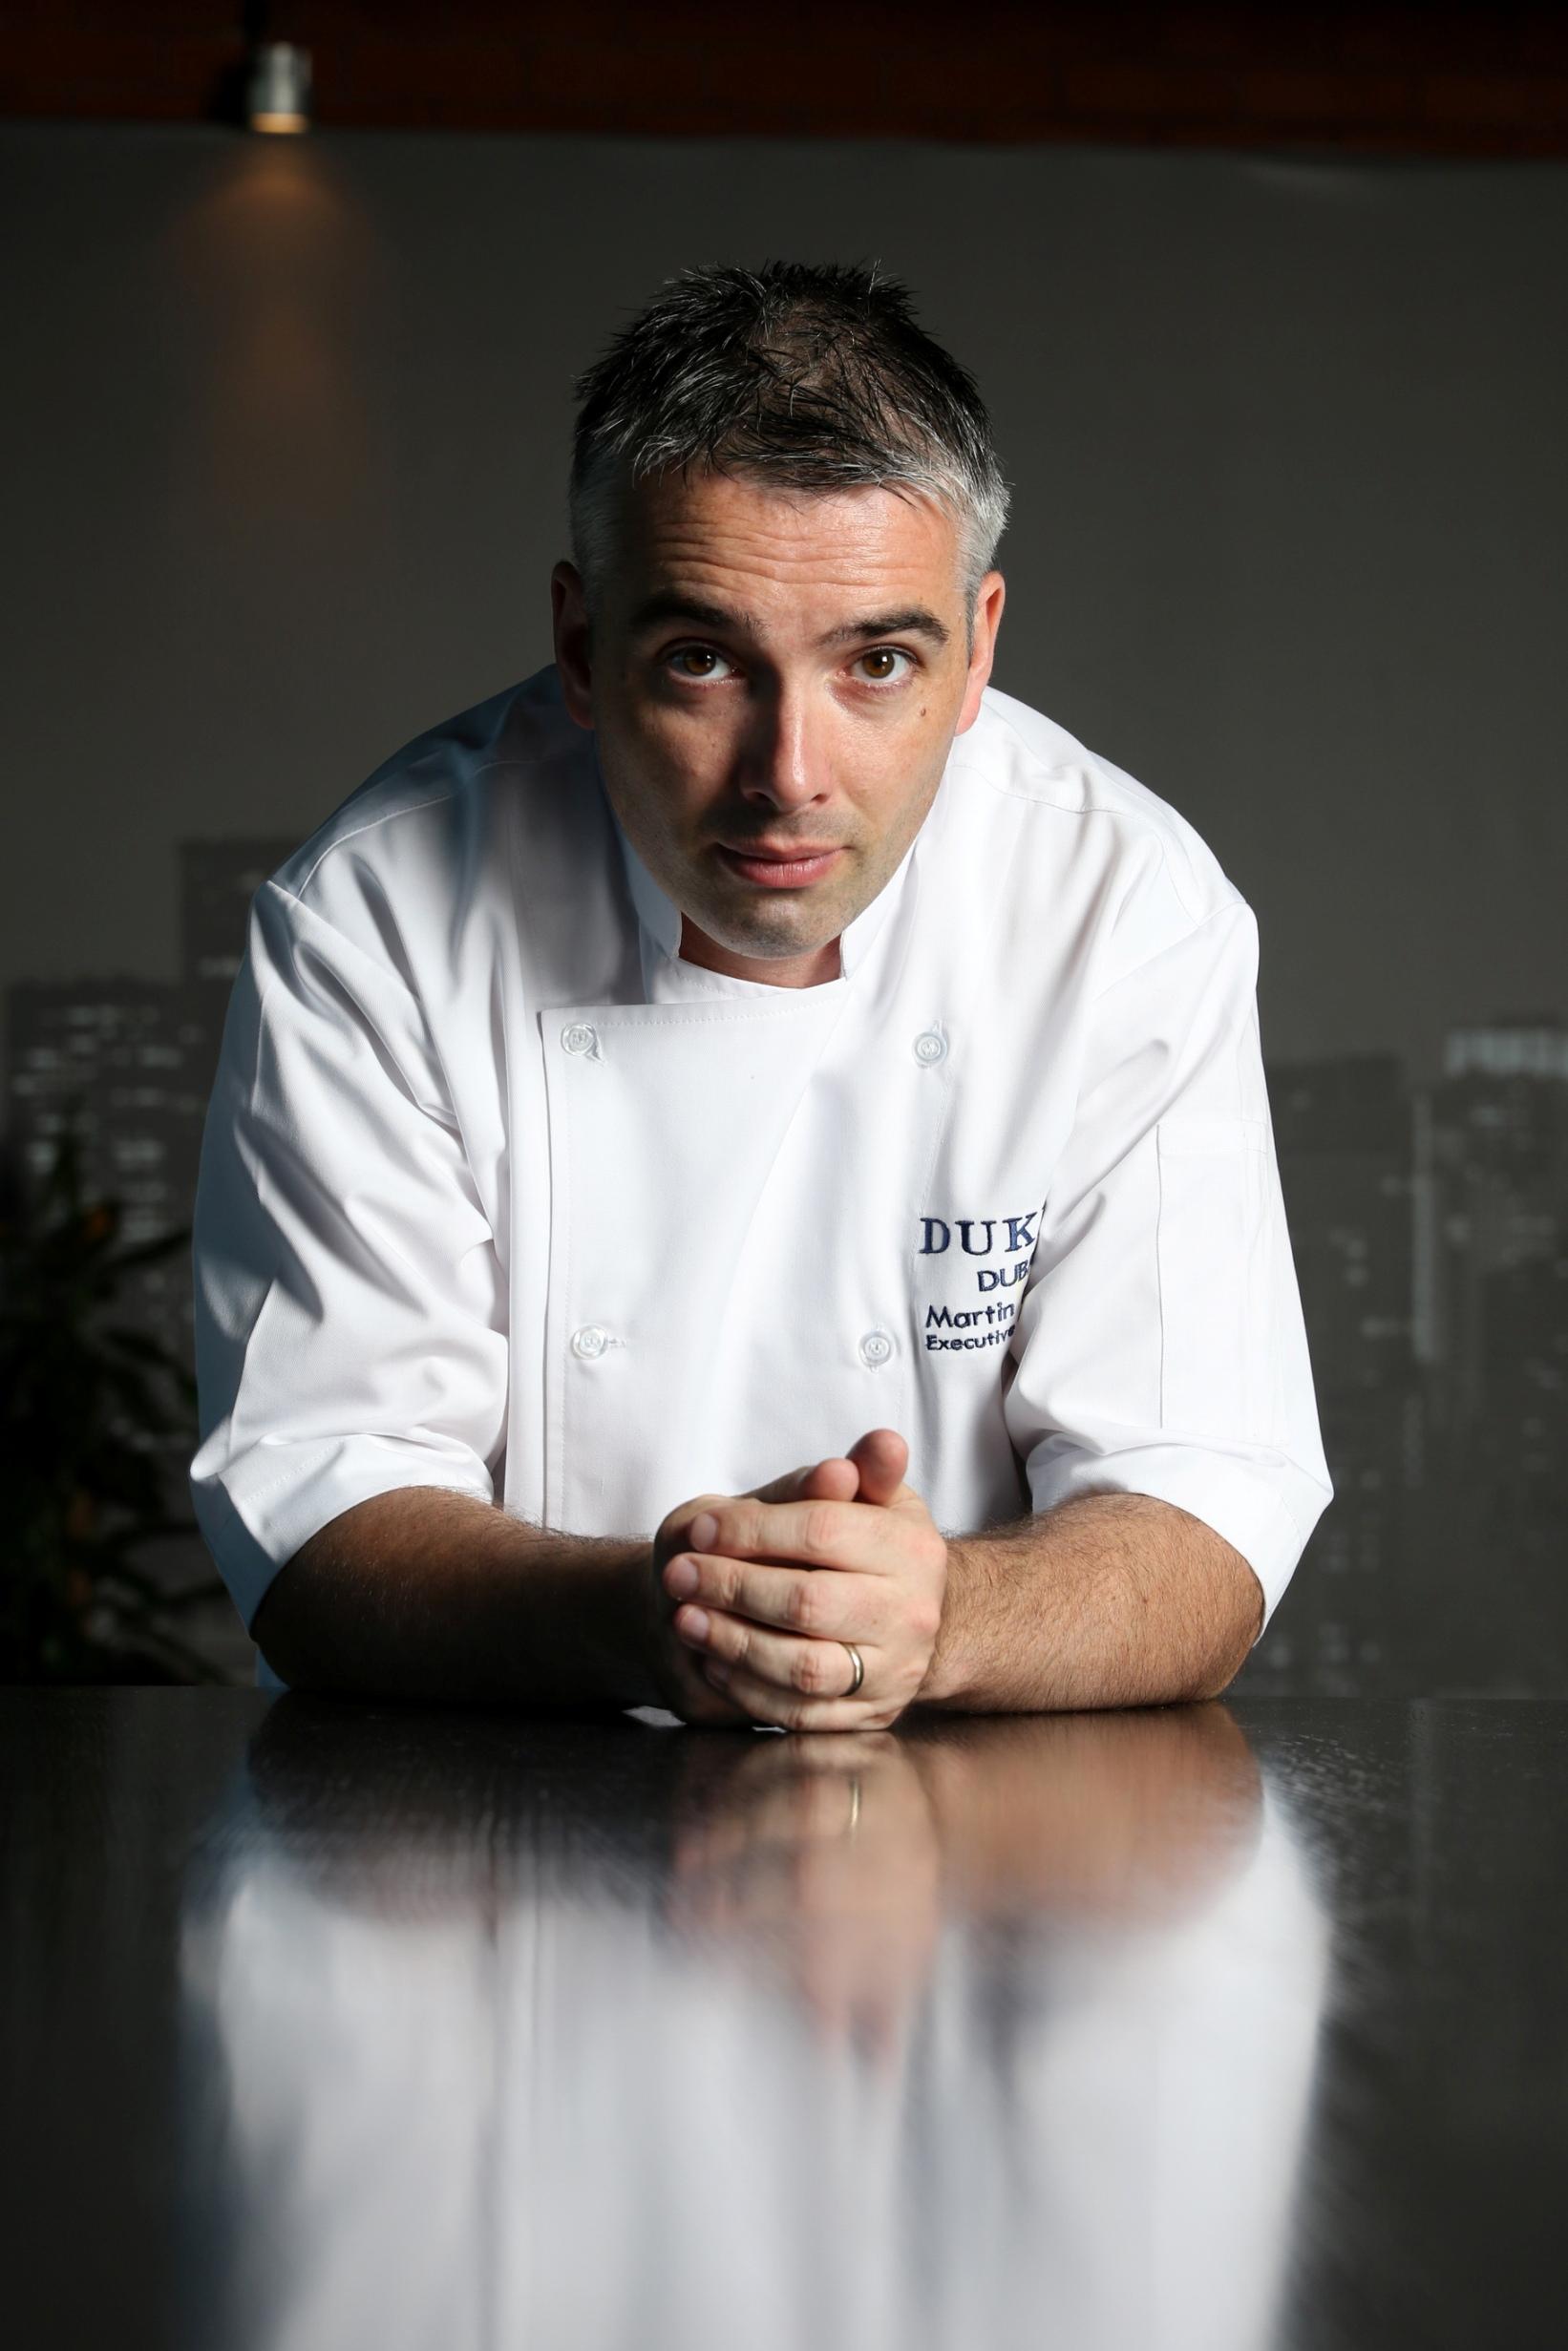 chef-martin-cahill-executive-chef-dukes-dubai